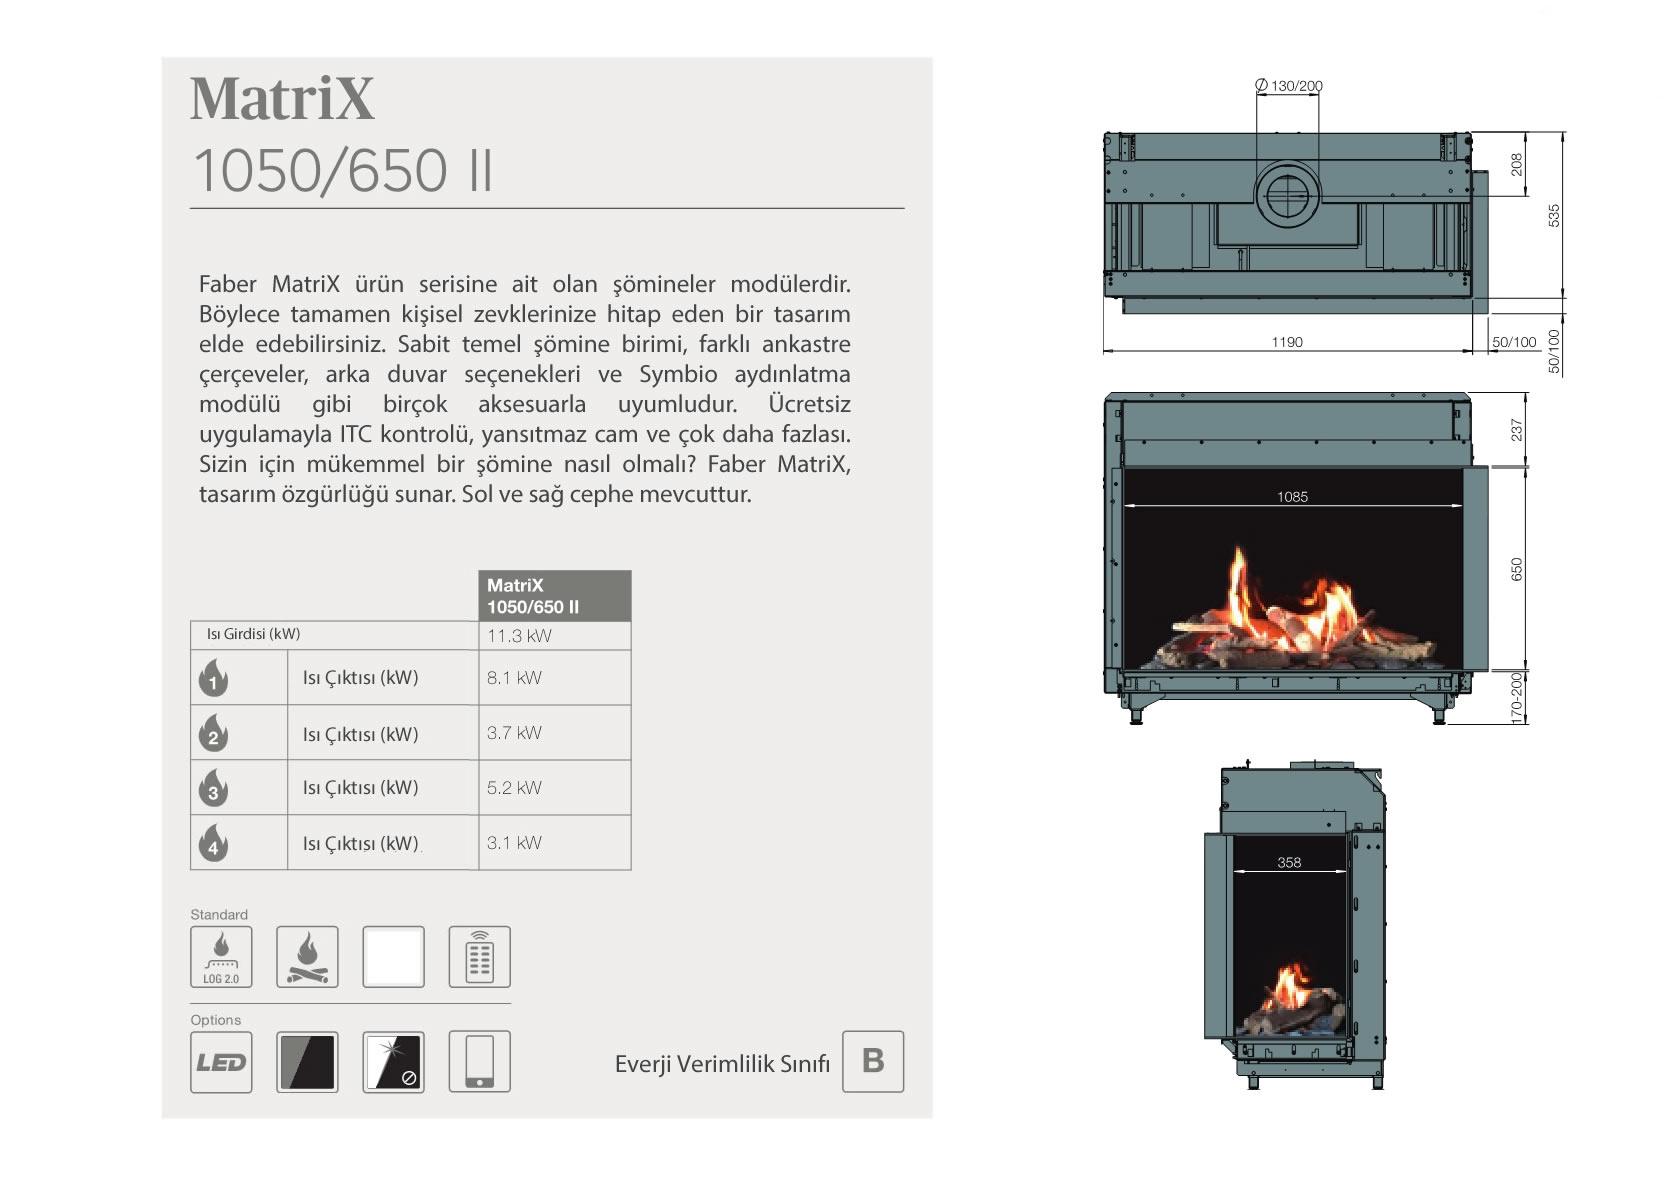 Faber Natural Gas Fireplaces - MATRİX 1050 / 650 II